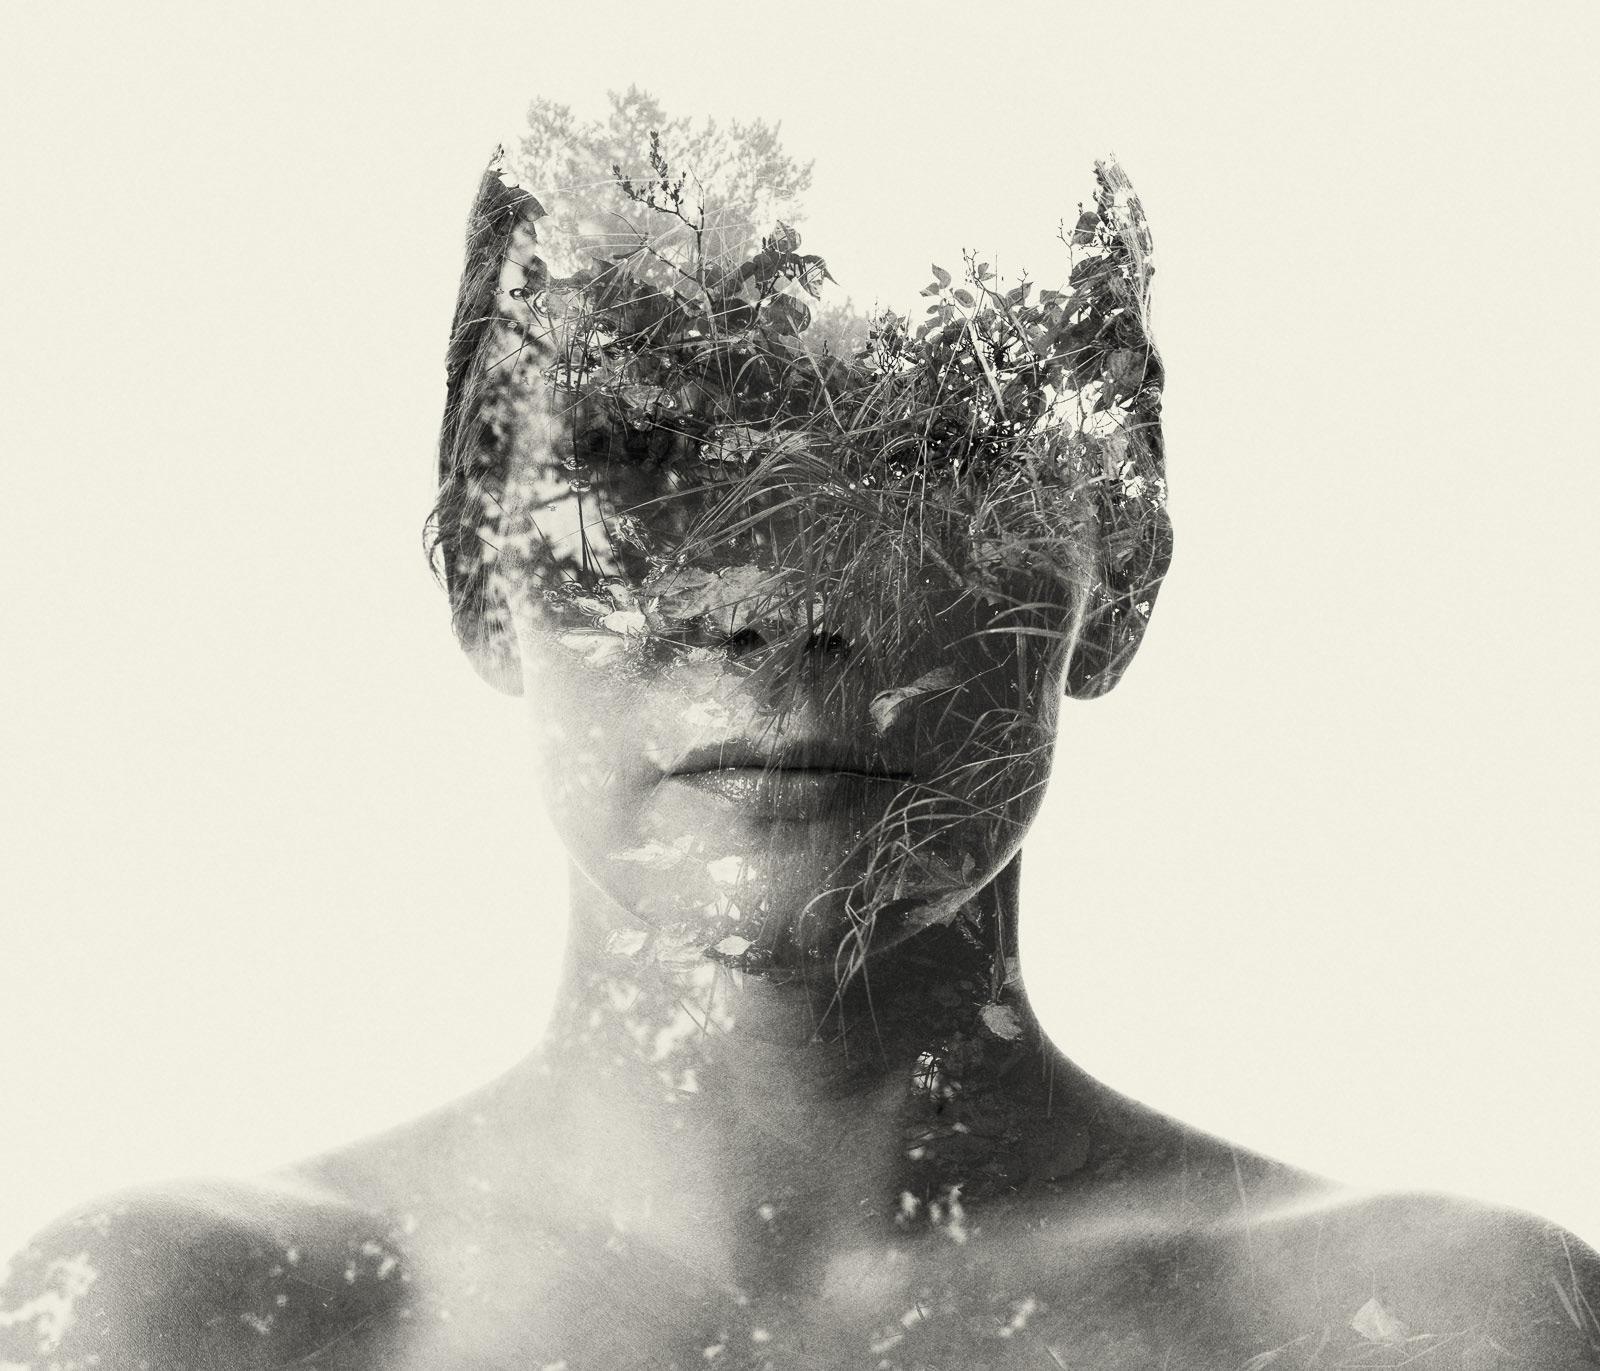 Figuras Humanas Distorcidas pela Natureza